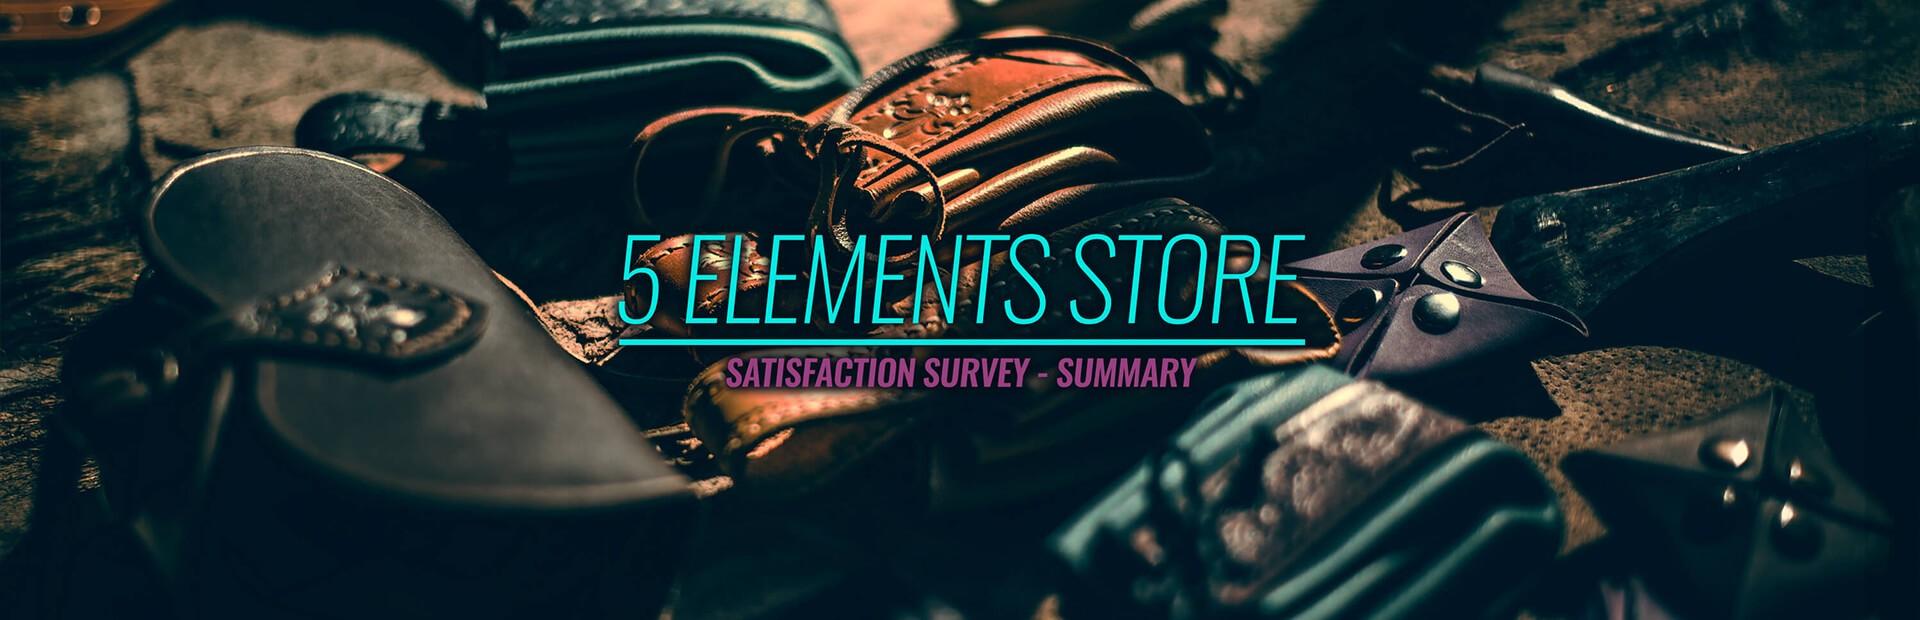 5 Elements Online Store